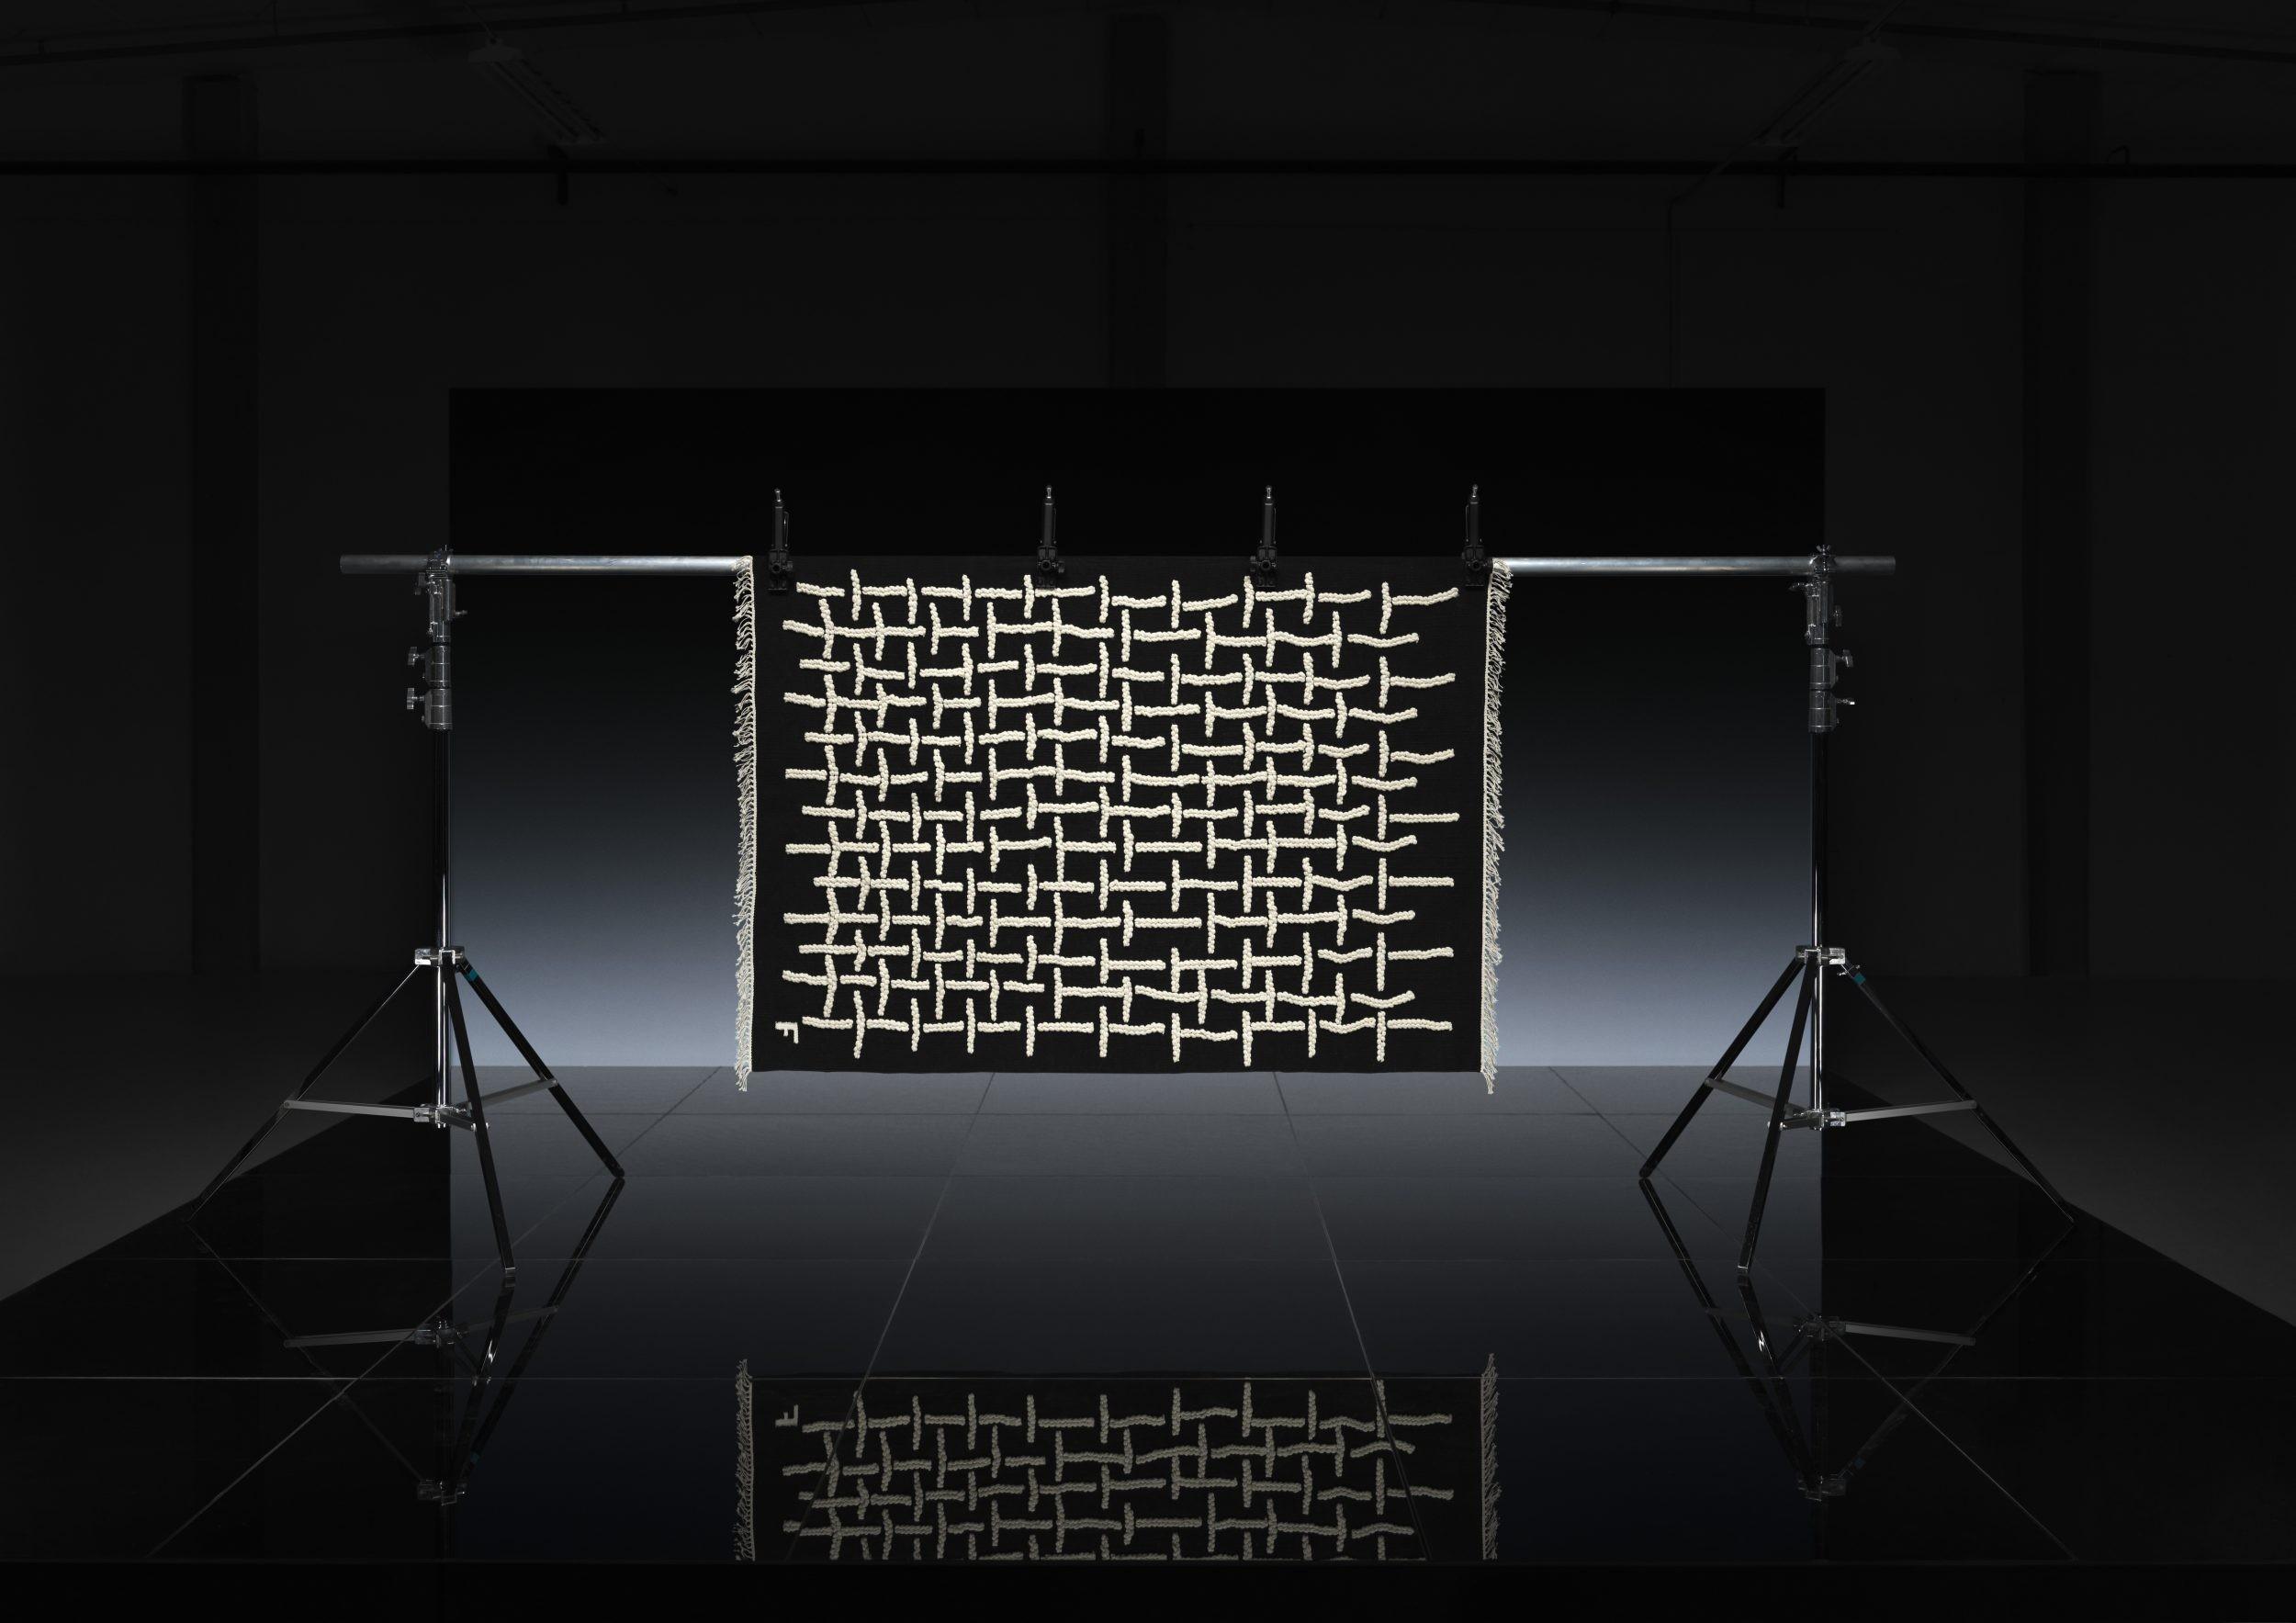 ▲IKEA艺术节。(图/翻摄自IKEA官网)